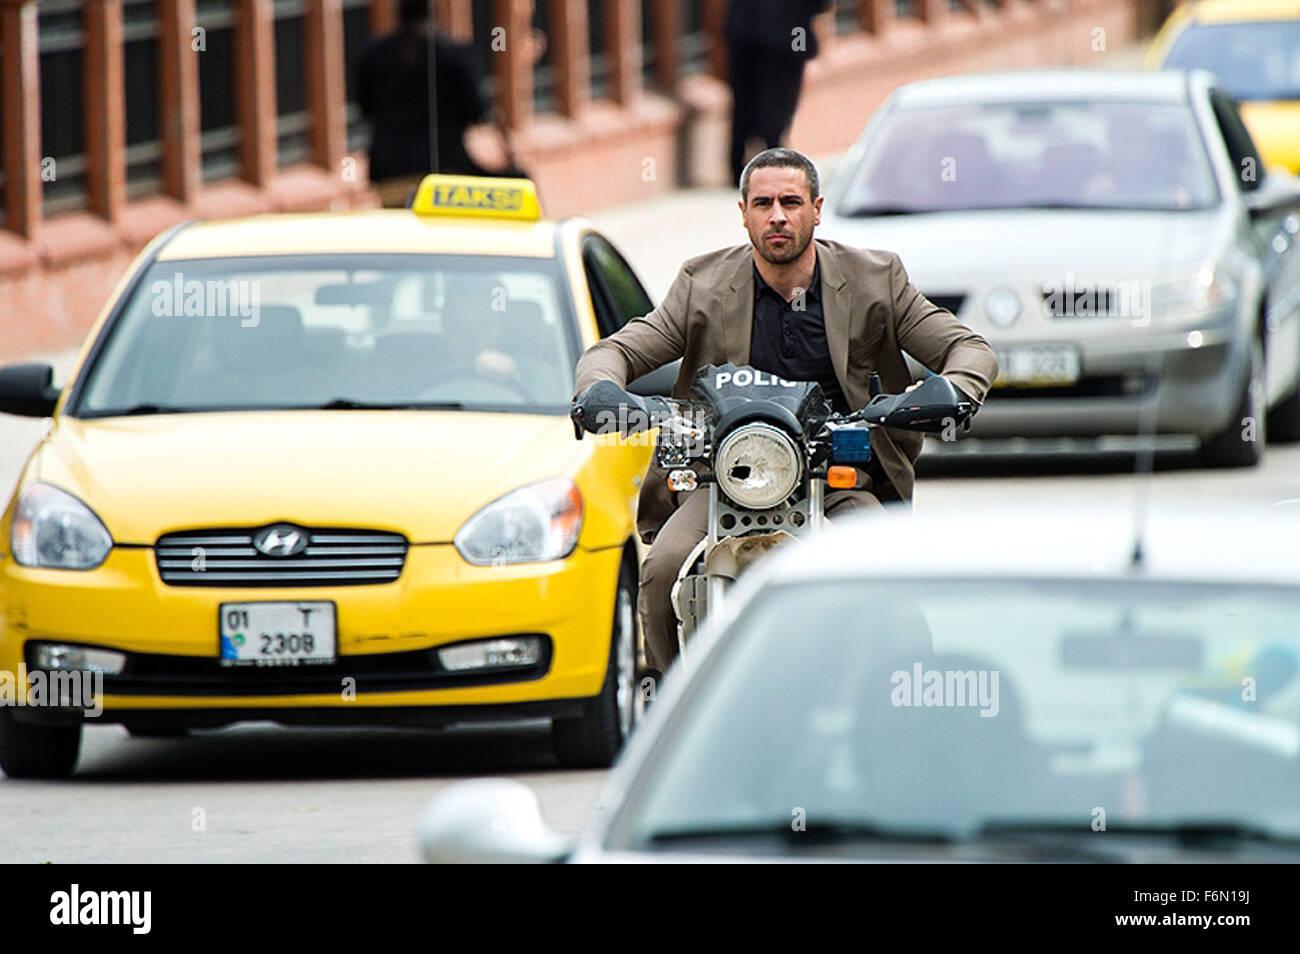 RELEASE DATE: November 9, 2012 MOVIE TITLE: 007 Skyfall DIRECTOR